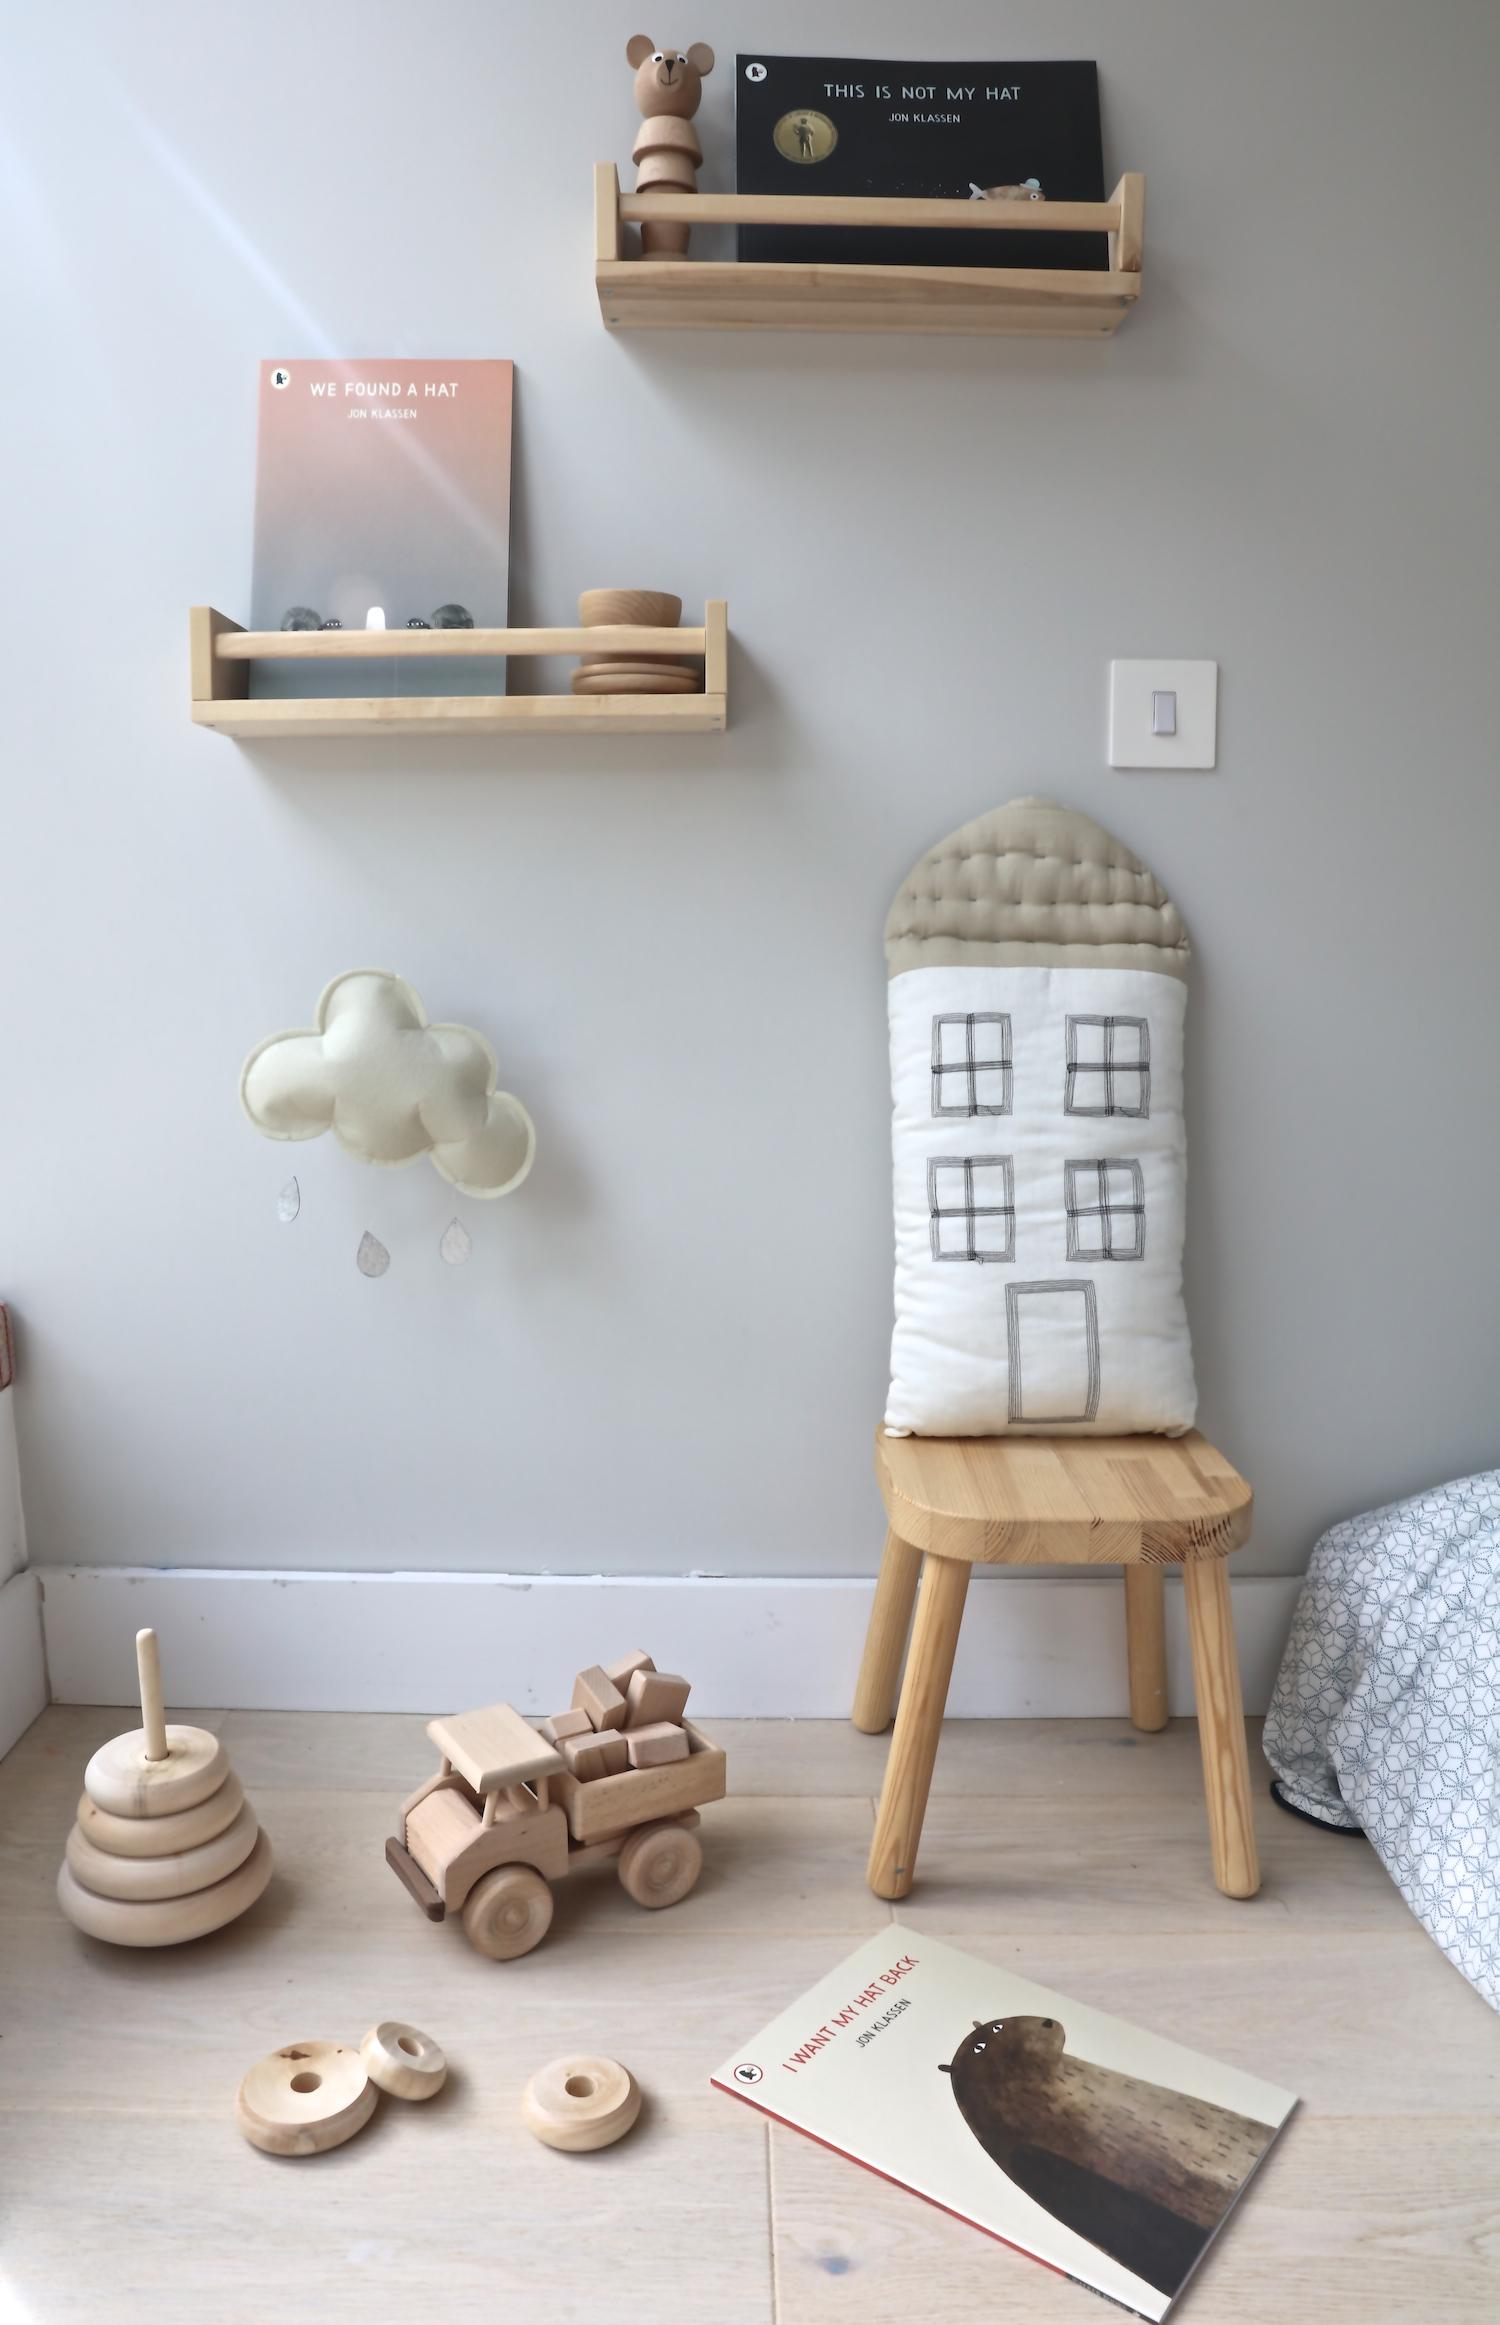 Camomile_london_house_cushion_pillow_giveawa7